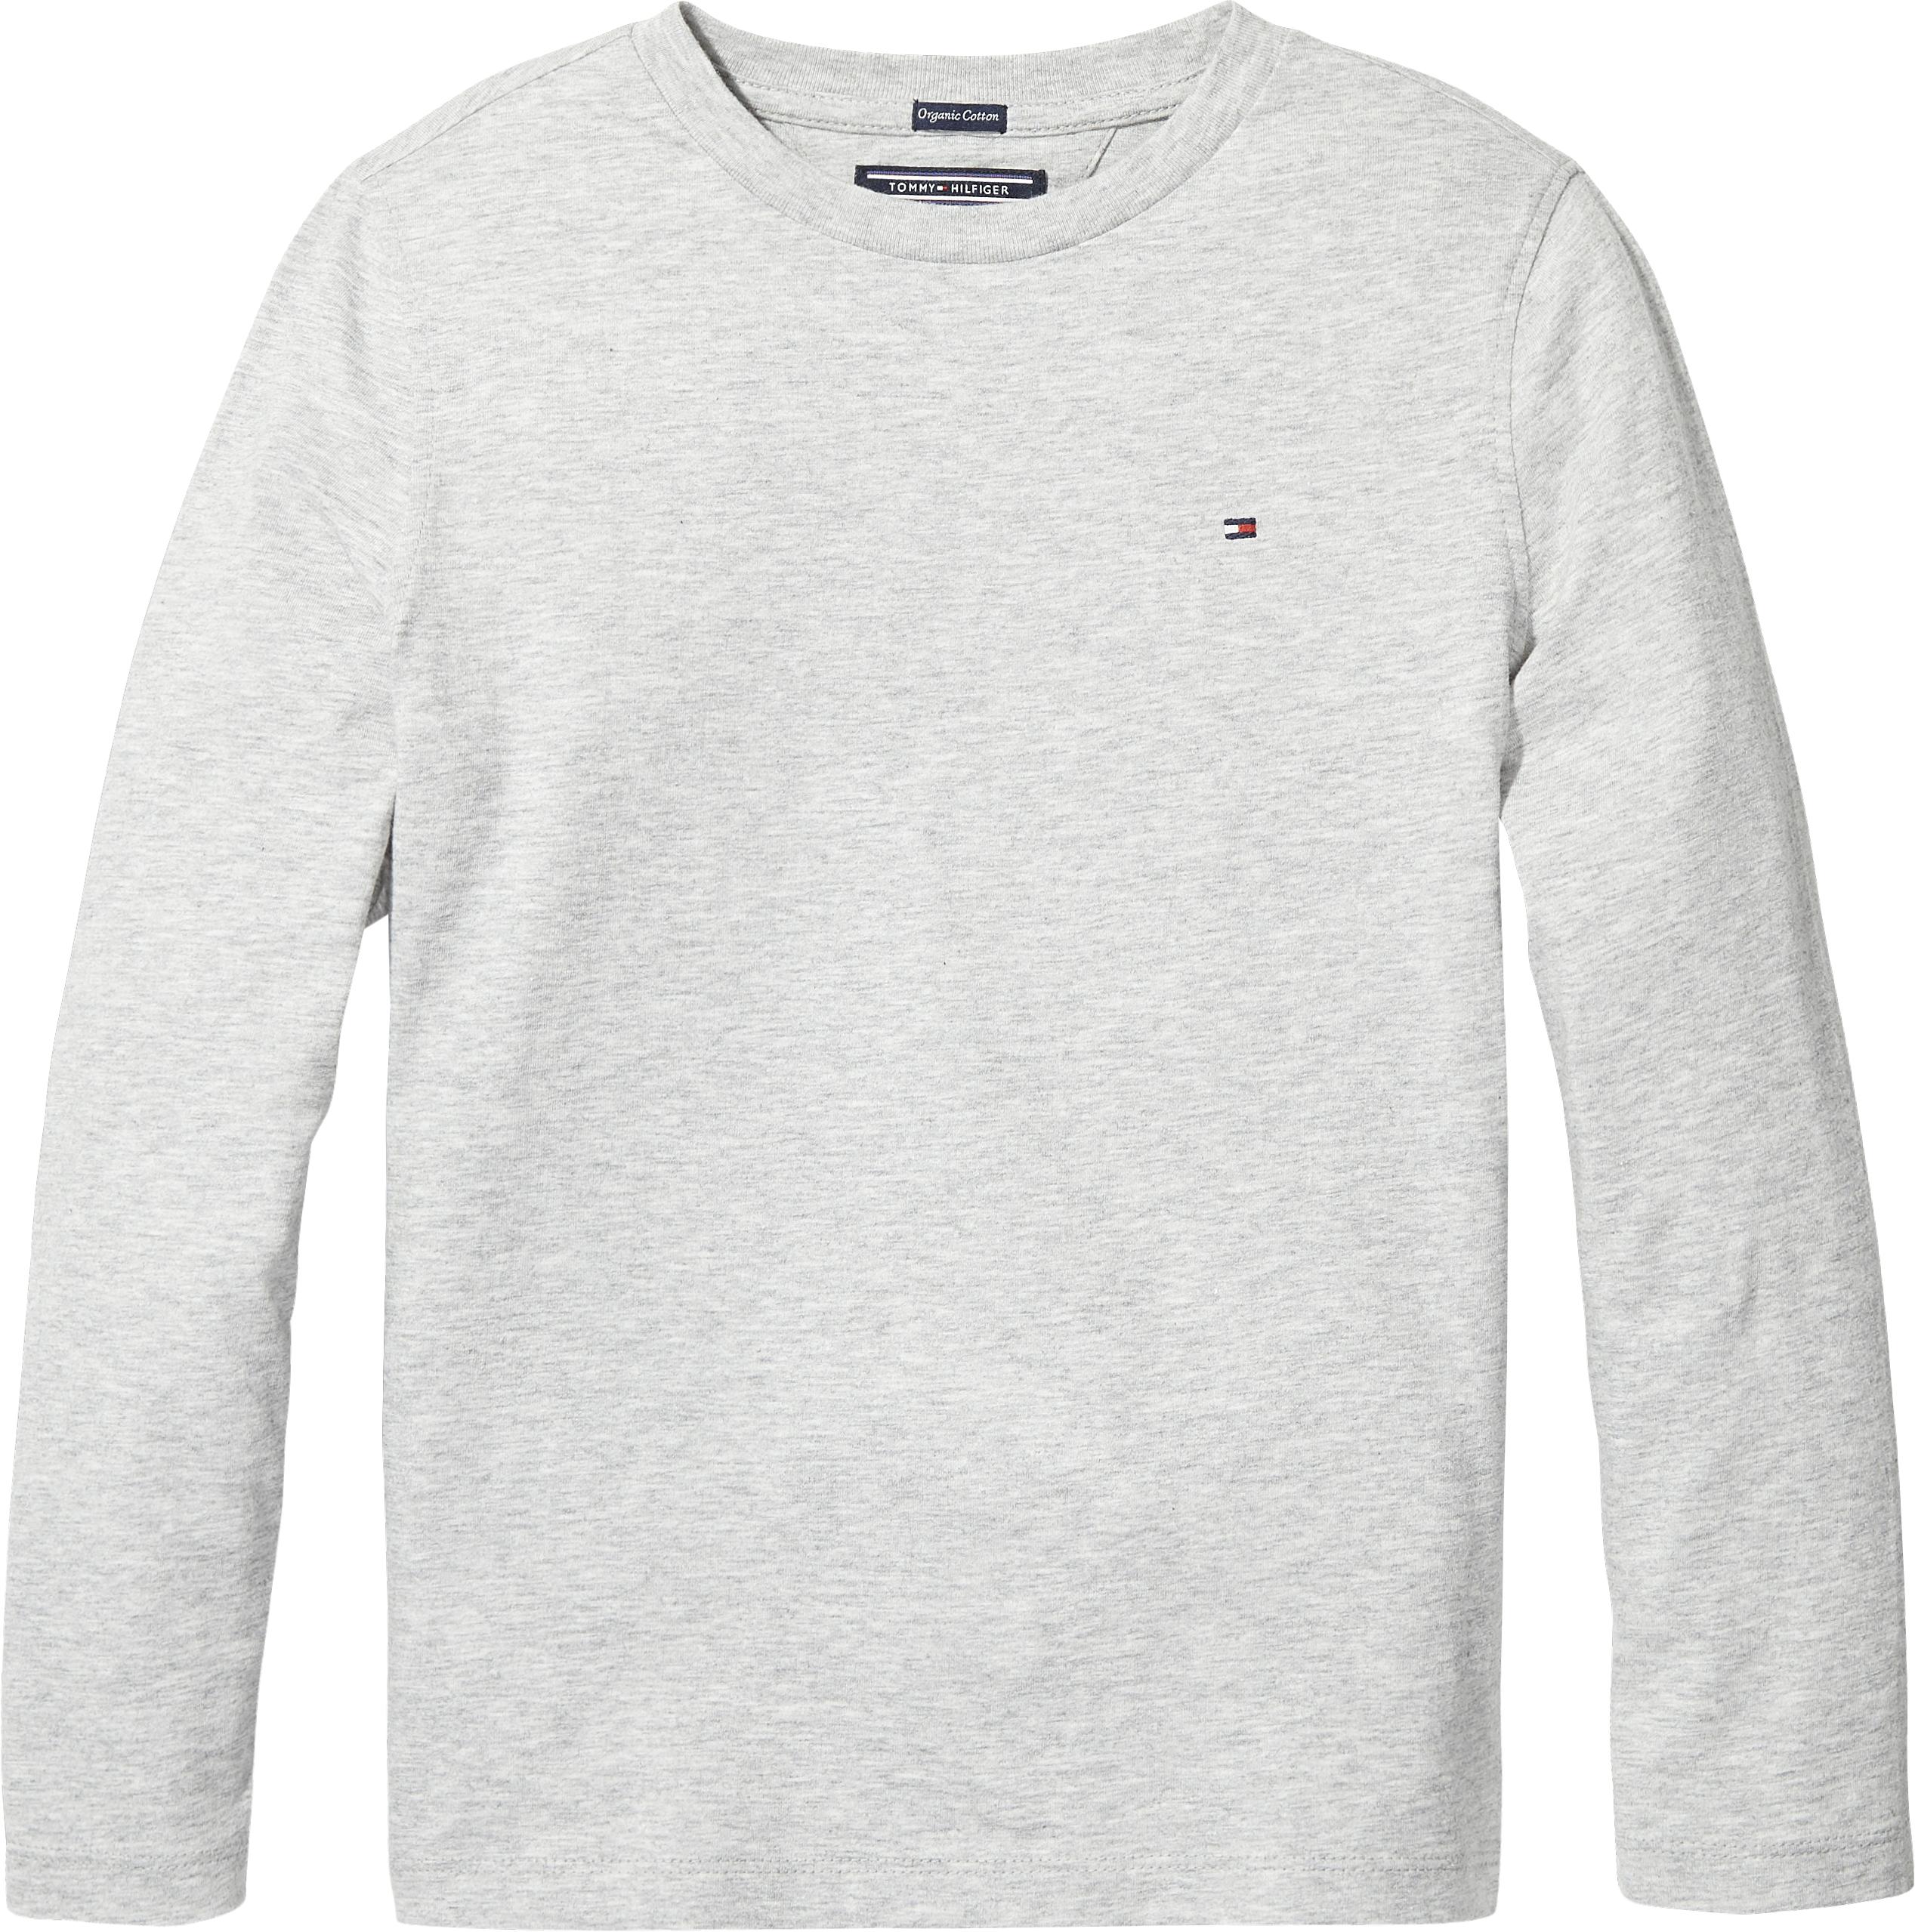 Tommy Hilfiger Basic L/S t-shirt